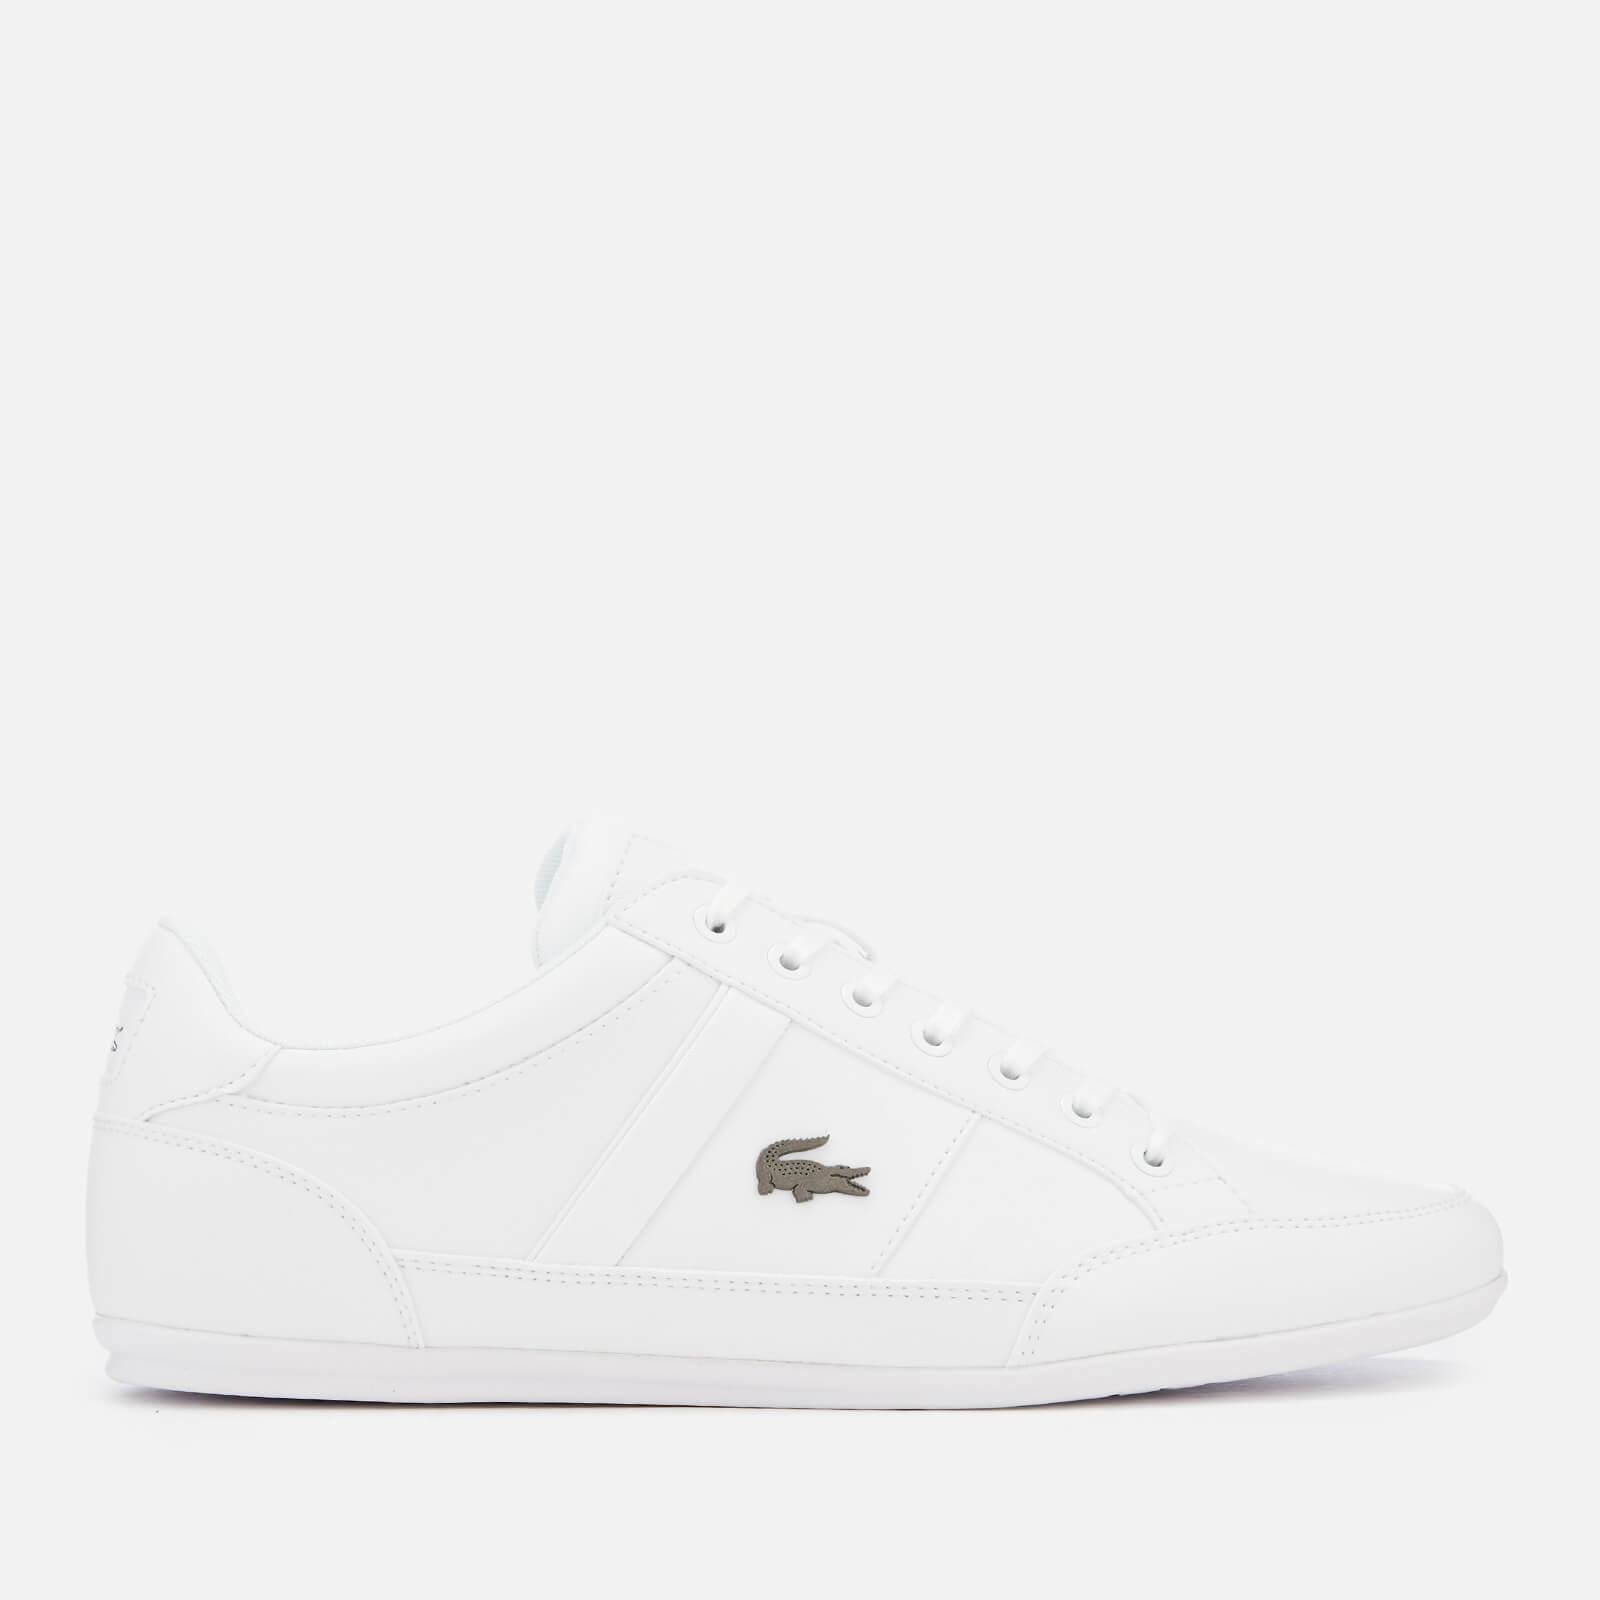 f8345e3ff192 Lacoste Men s Chaymon Bl 1 Leather Low Profile Trainers - White White Mens  Footwear